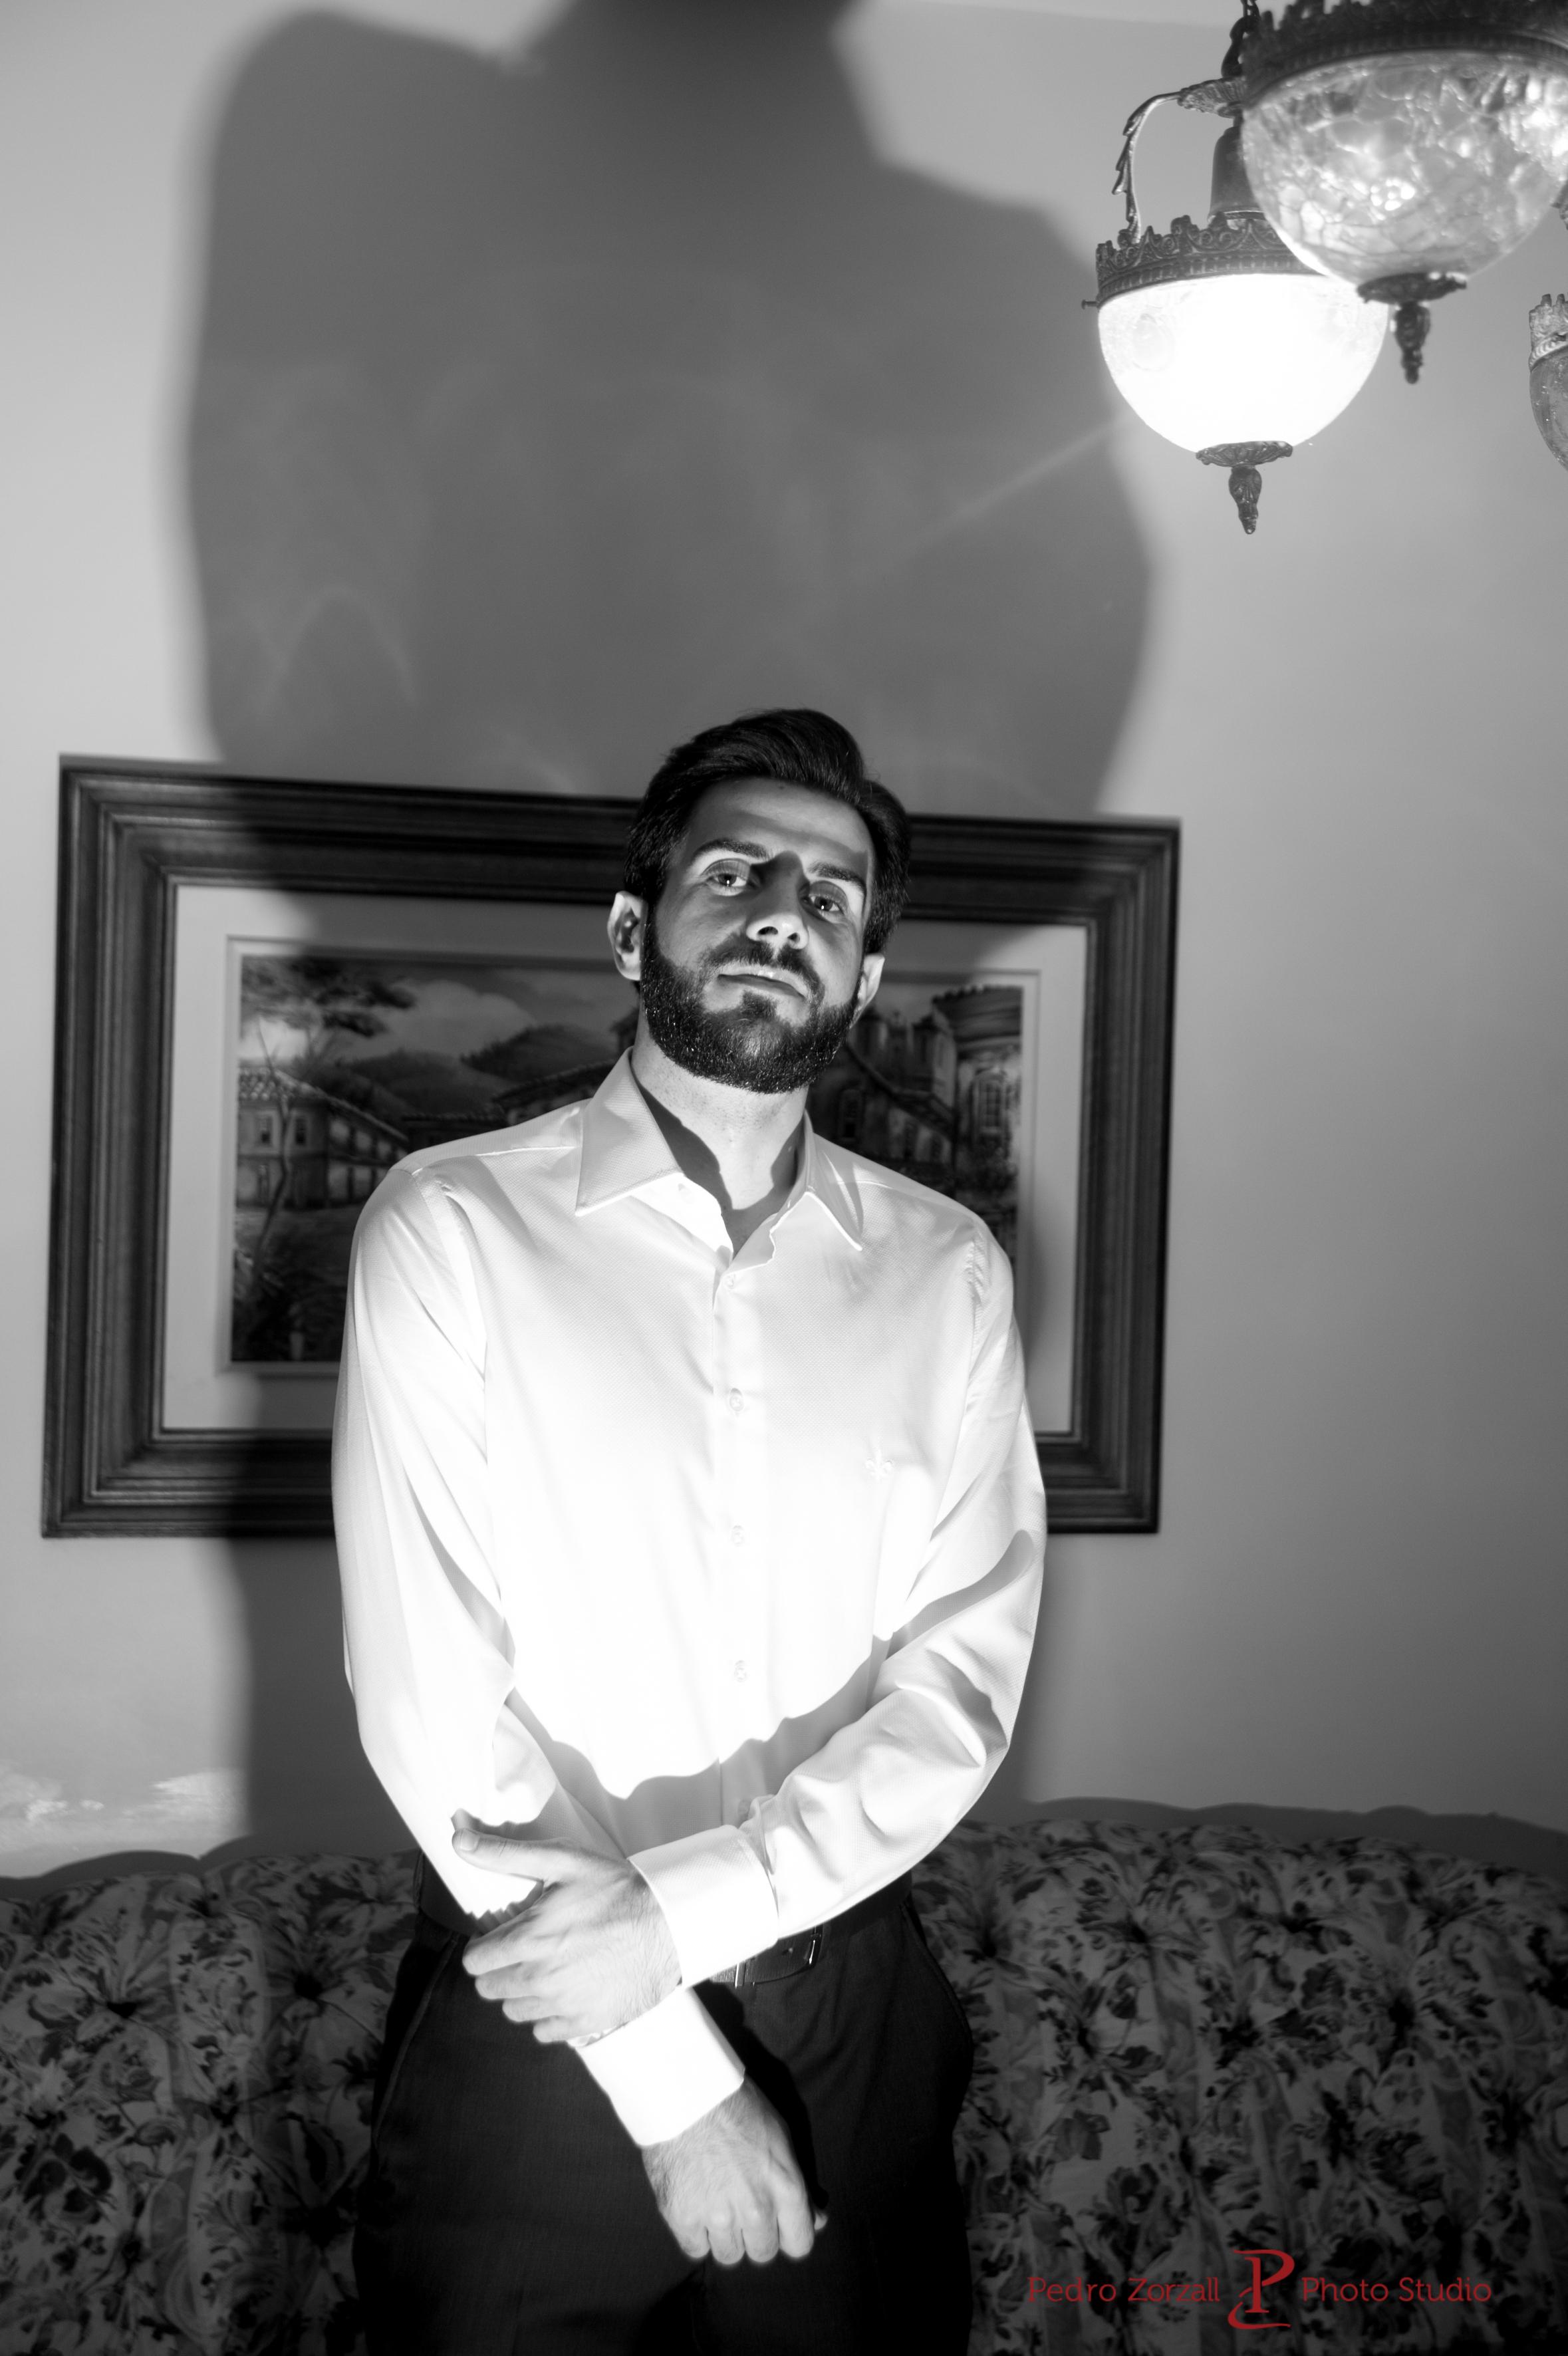 38fotografo Pedro Zorzall- fotografia de